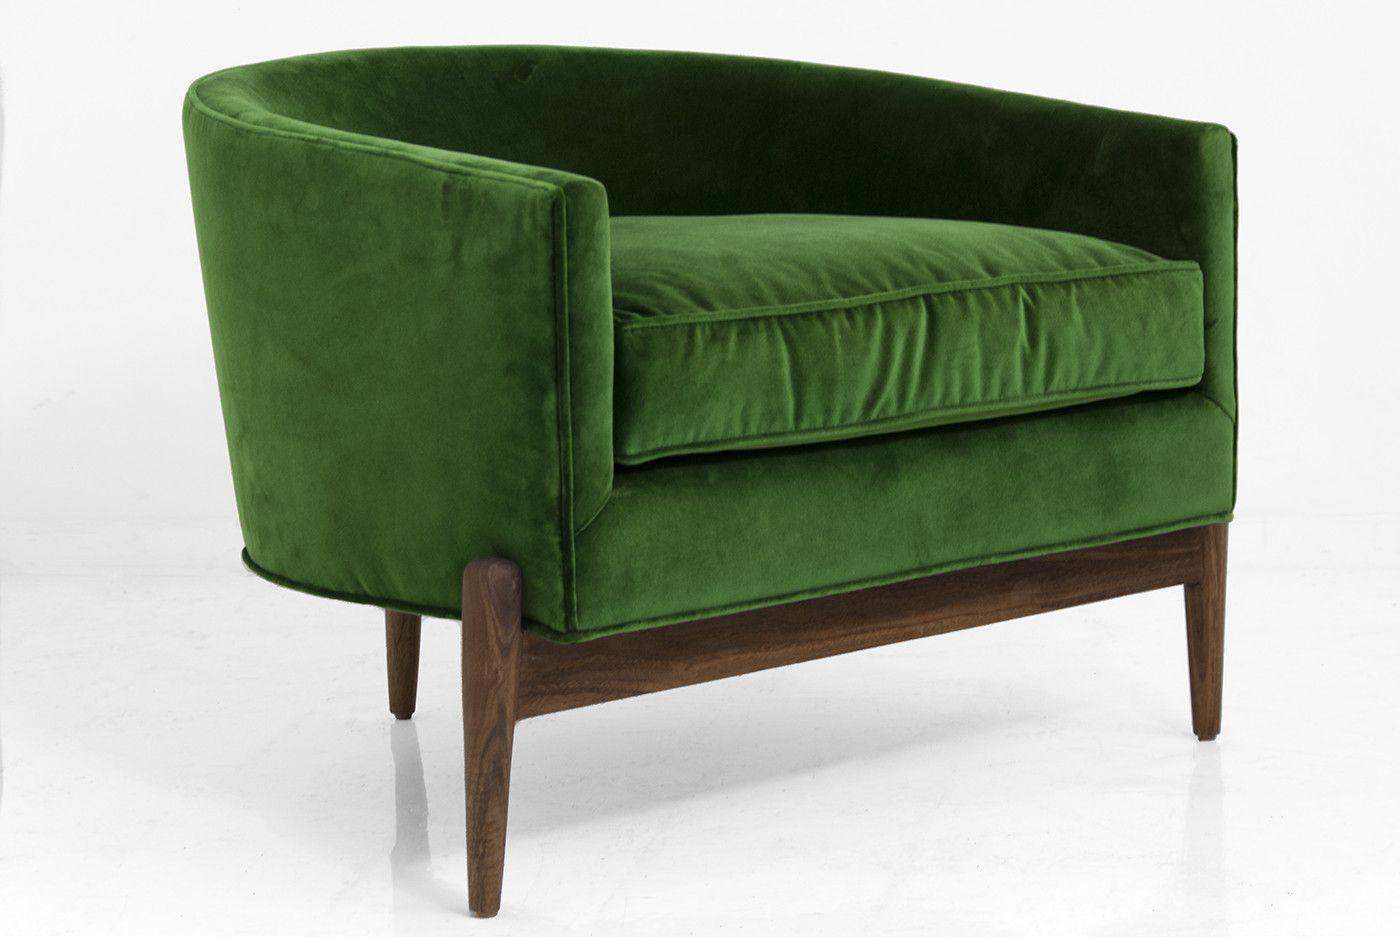 Art Deco Chair in Emerald Velvet $1595